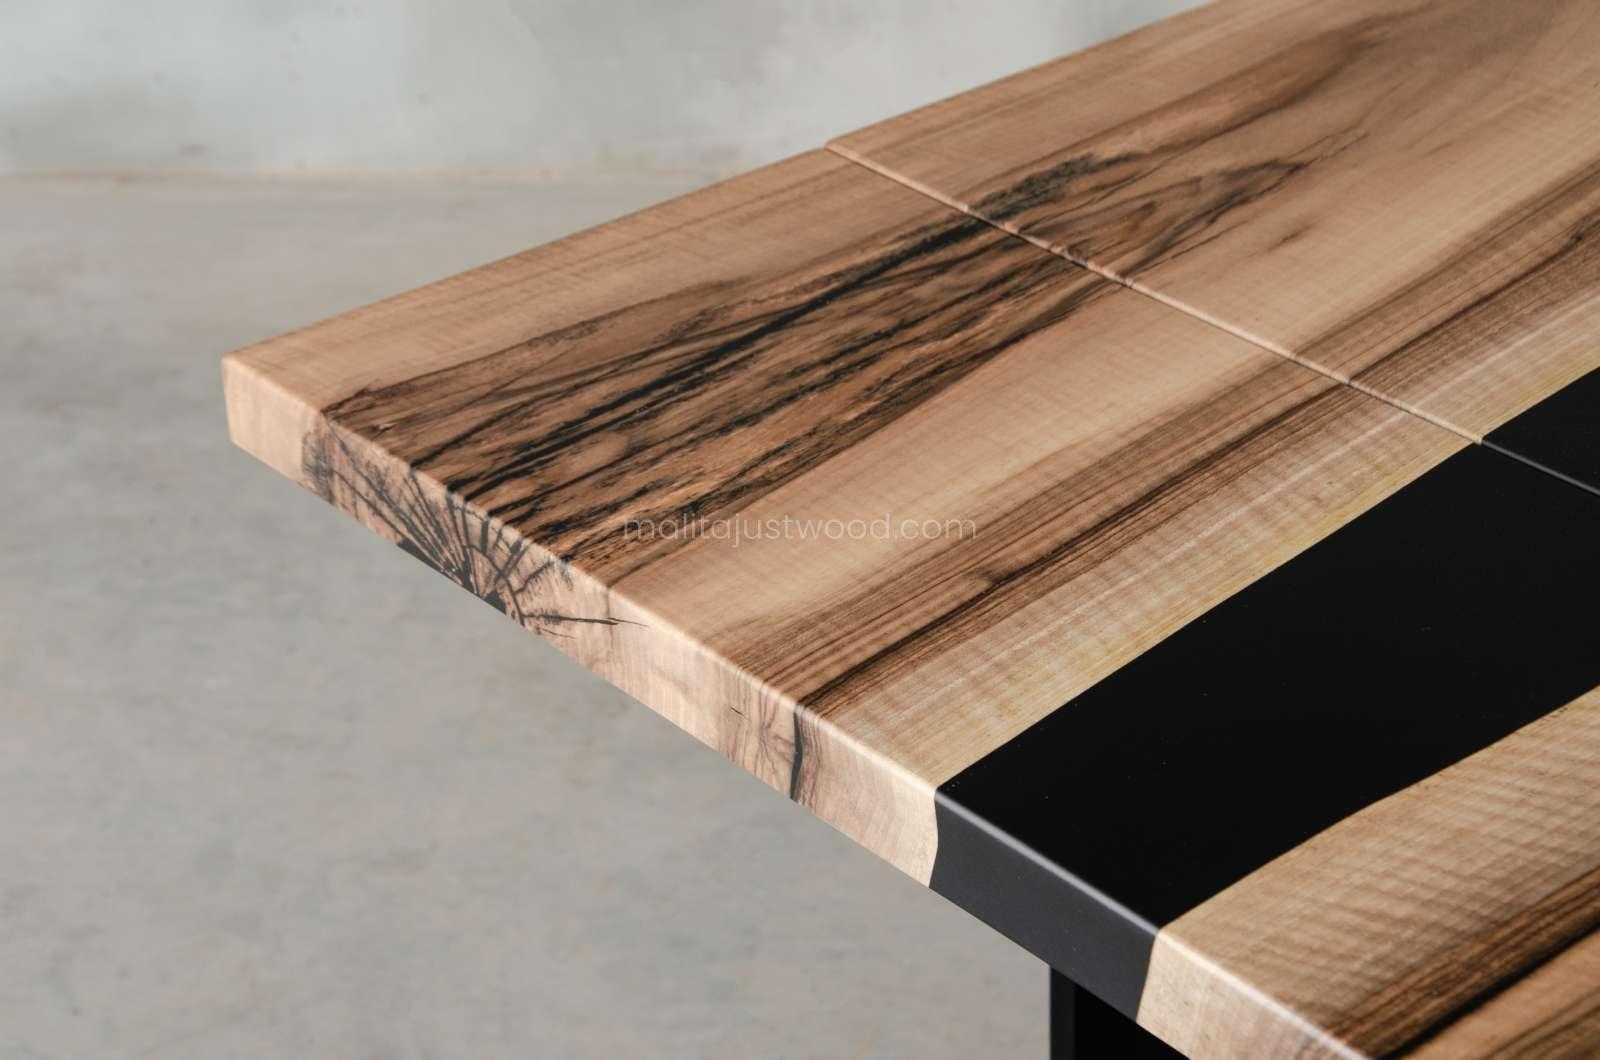 European walnut and black resin tenens table